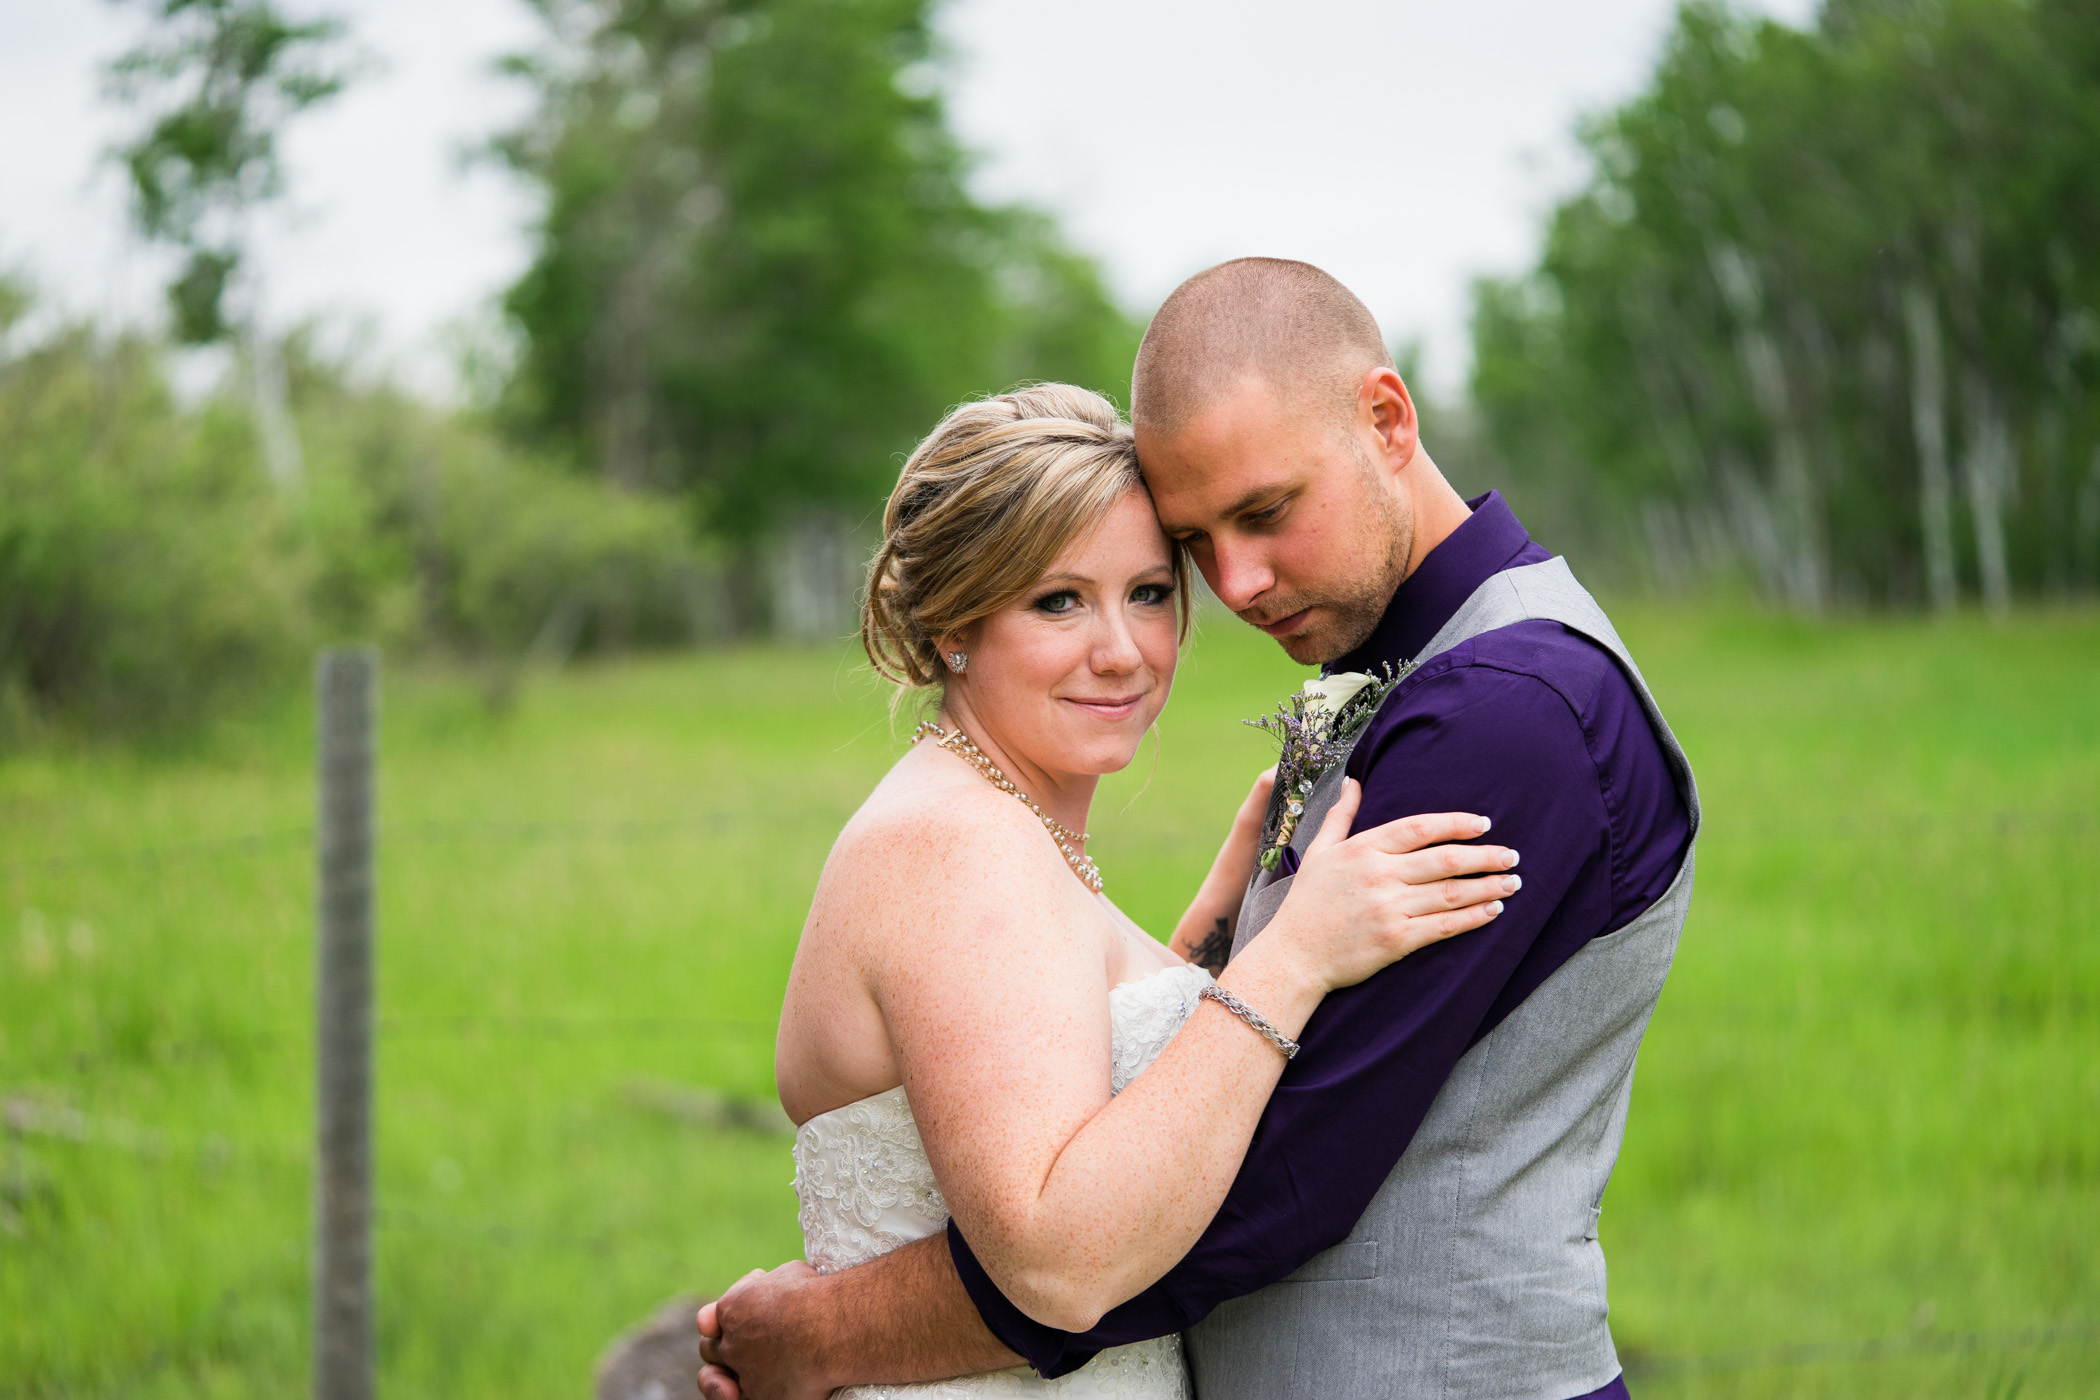 COJO Photo - Whitney and Steve - Wedding-431.jpg